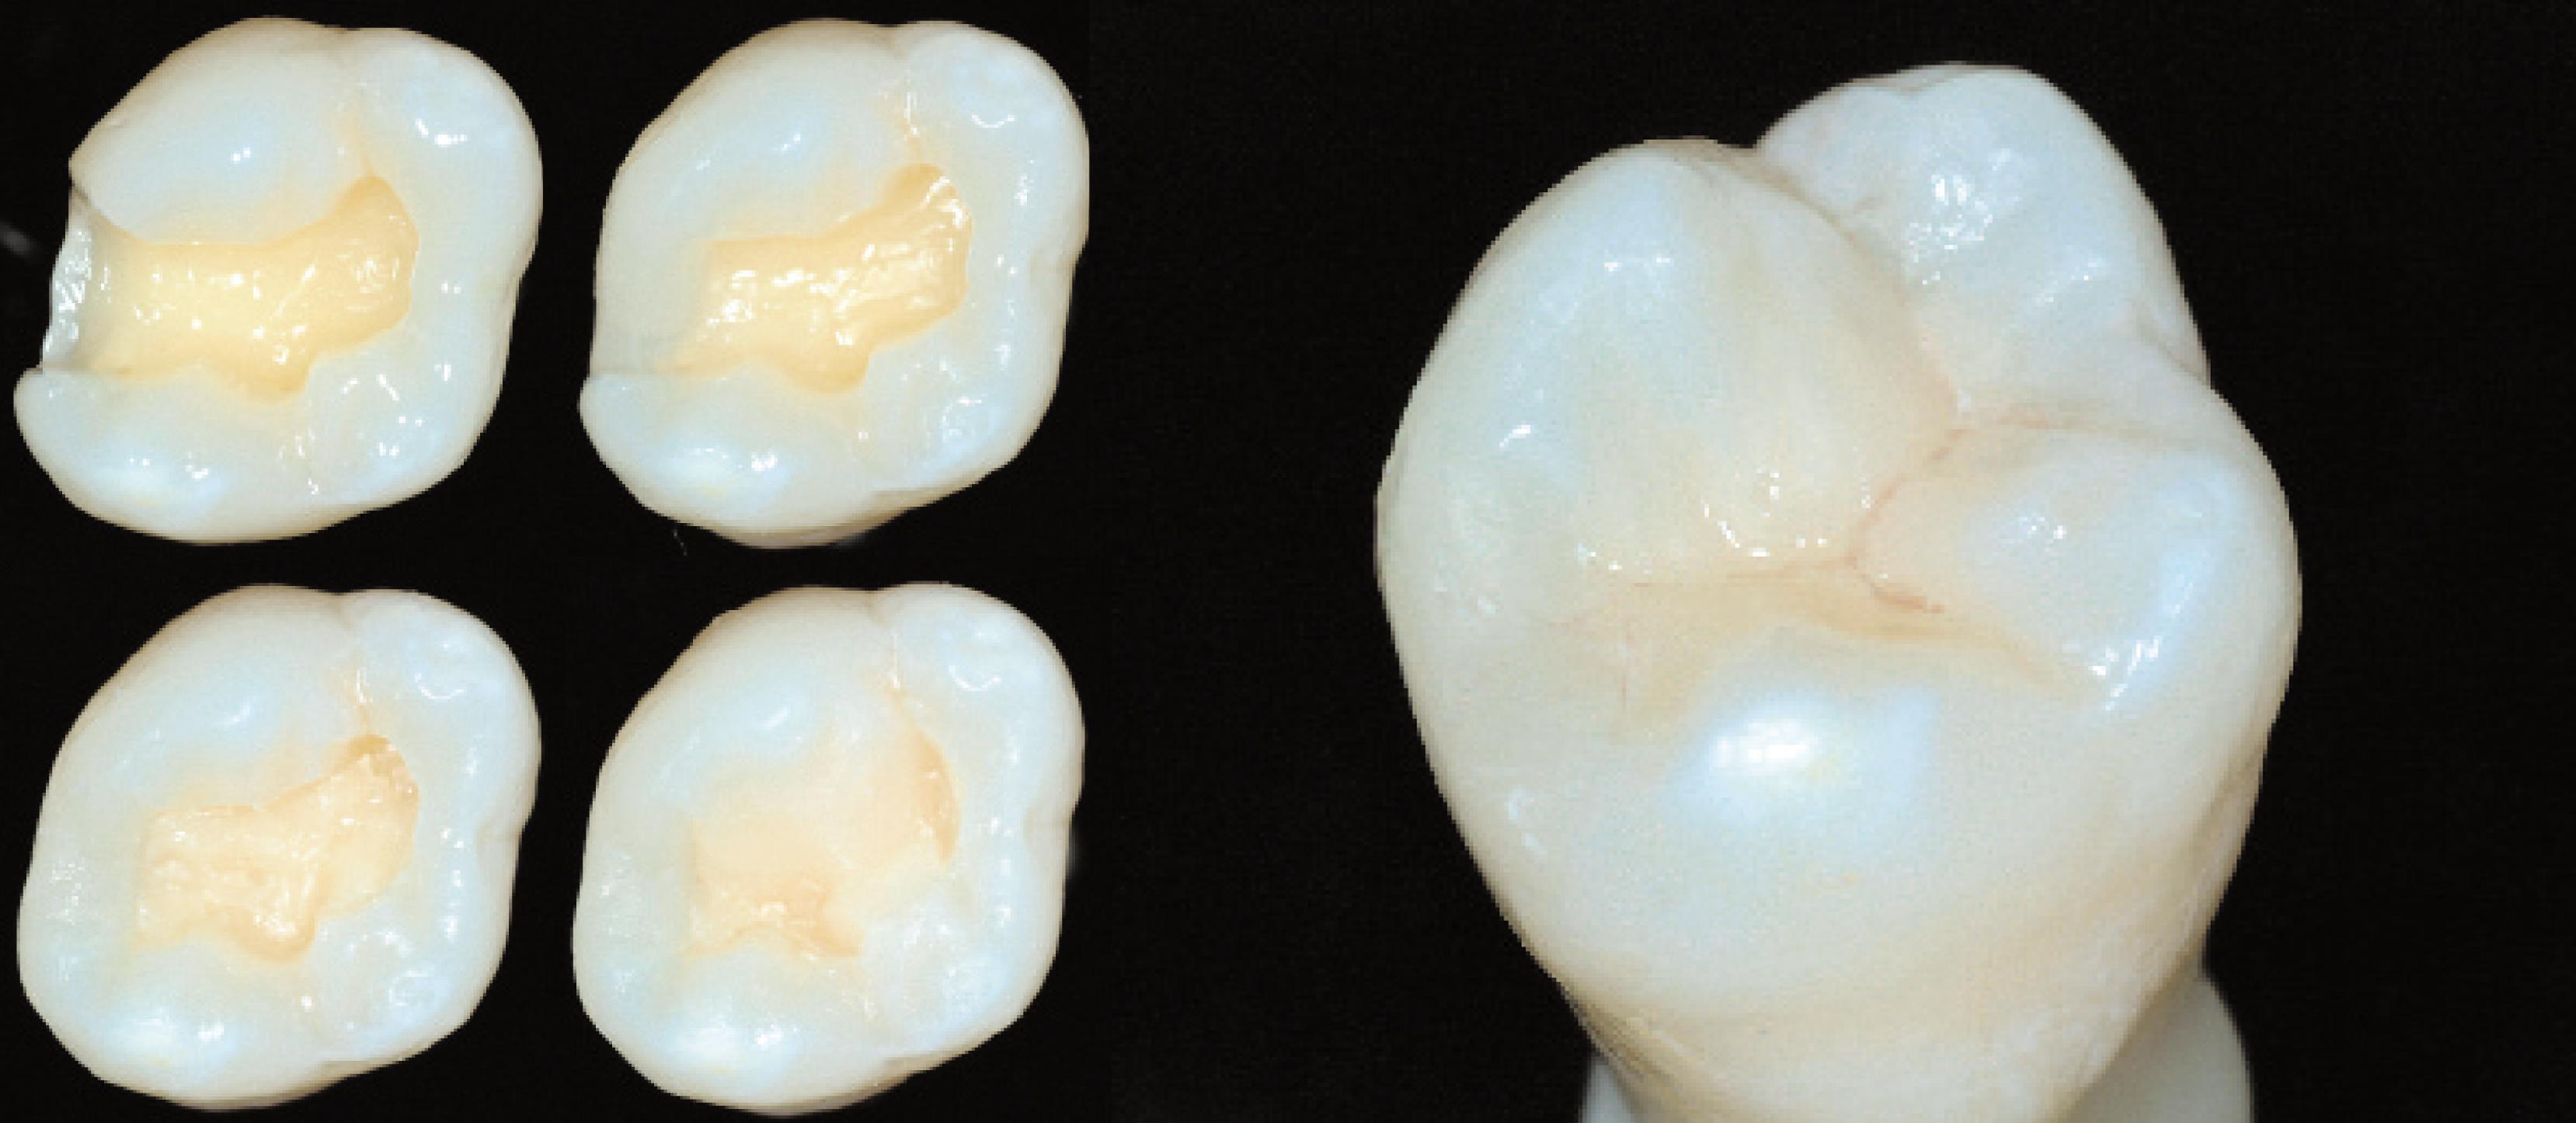 Obturaciones con resina dise o de sonrisa en barranquilla for Arcones de resina para exterior